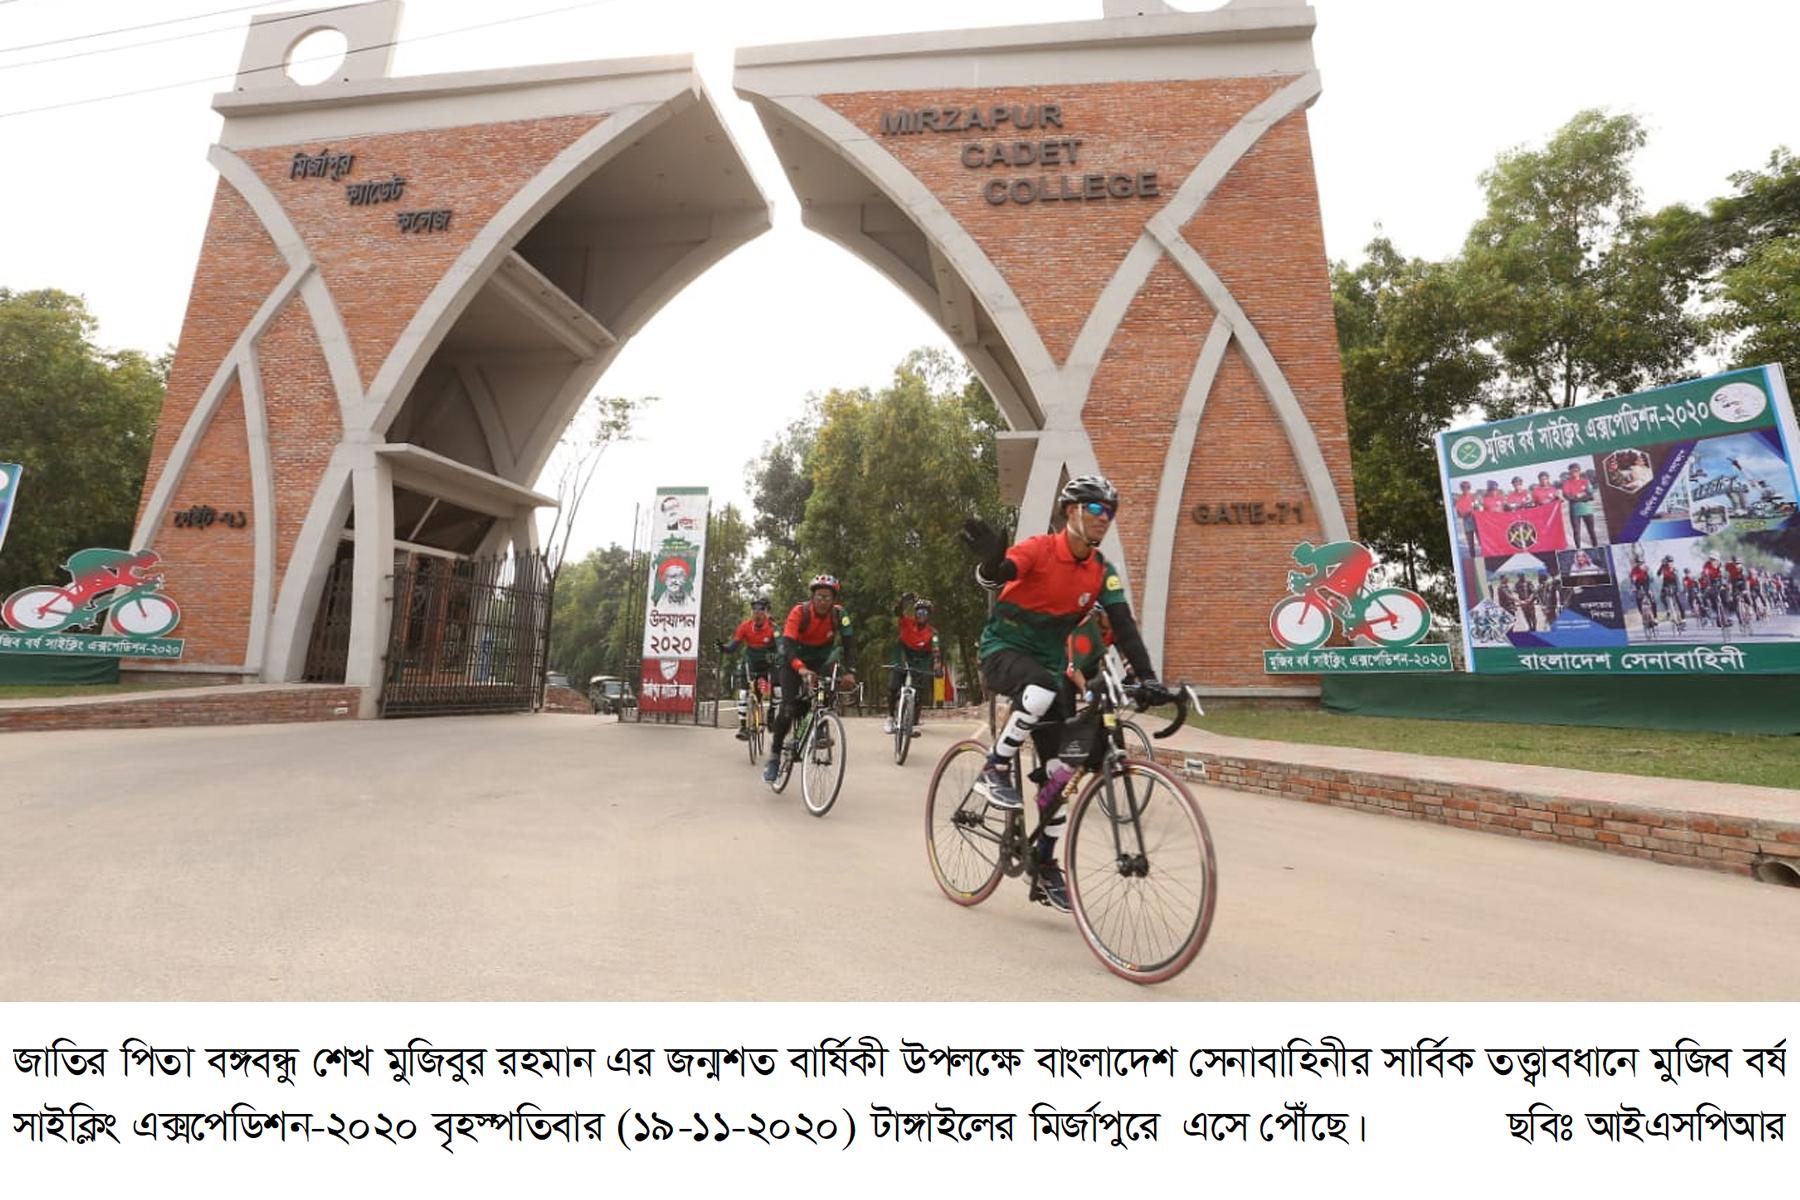 Army Cycling - 19-11-2020 (6)